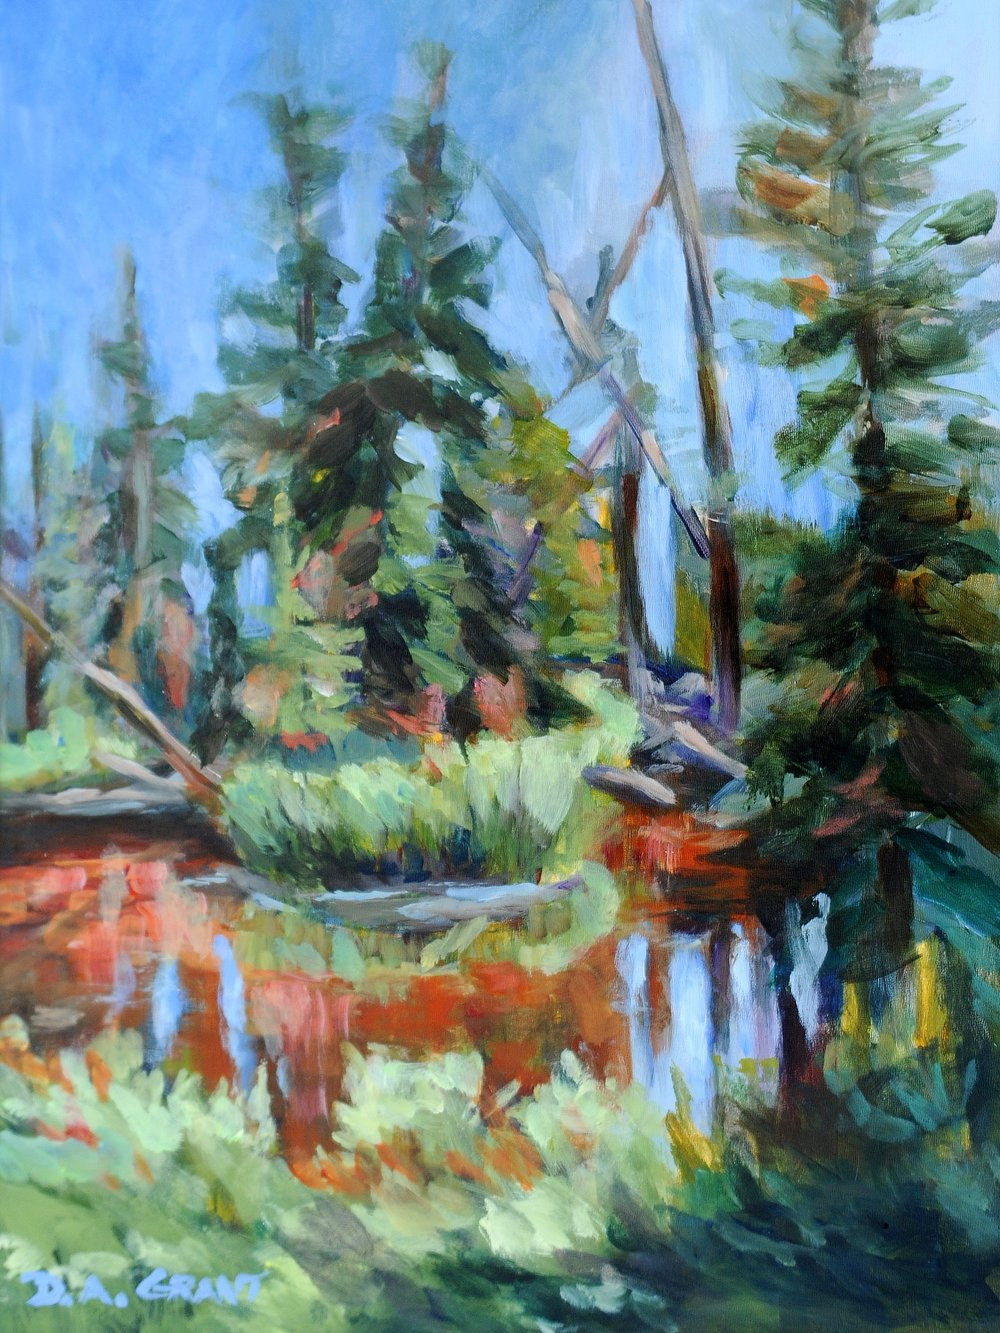 """Spruce River"" (Waskesiu), acrylic, 12x16"